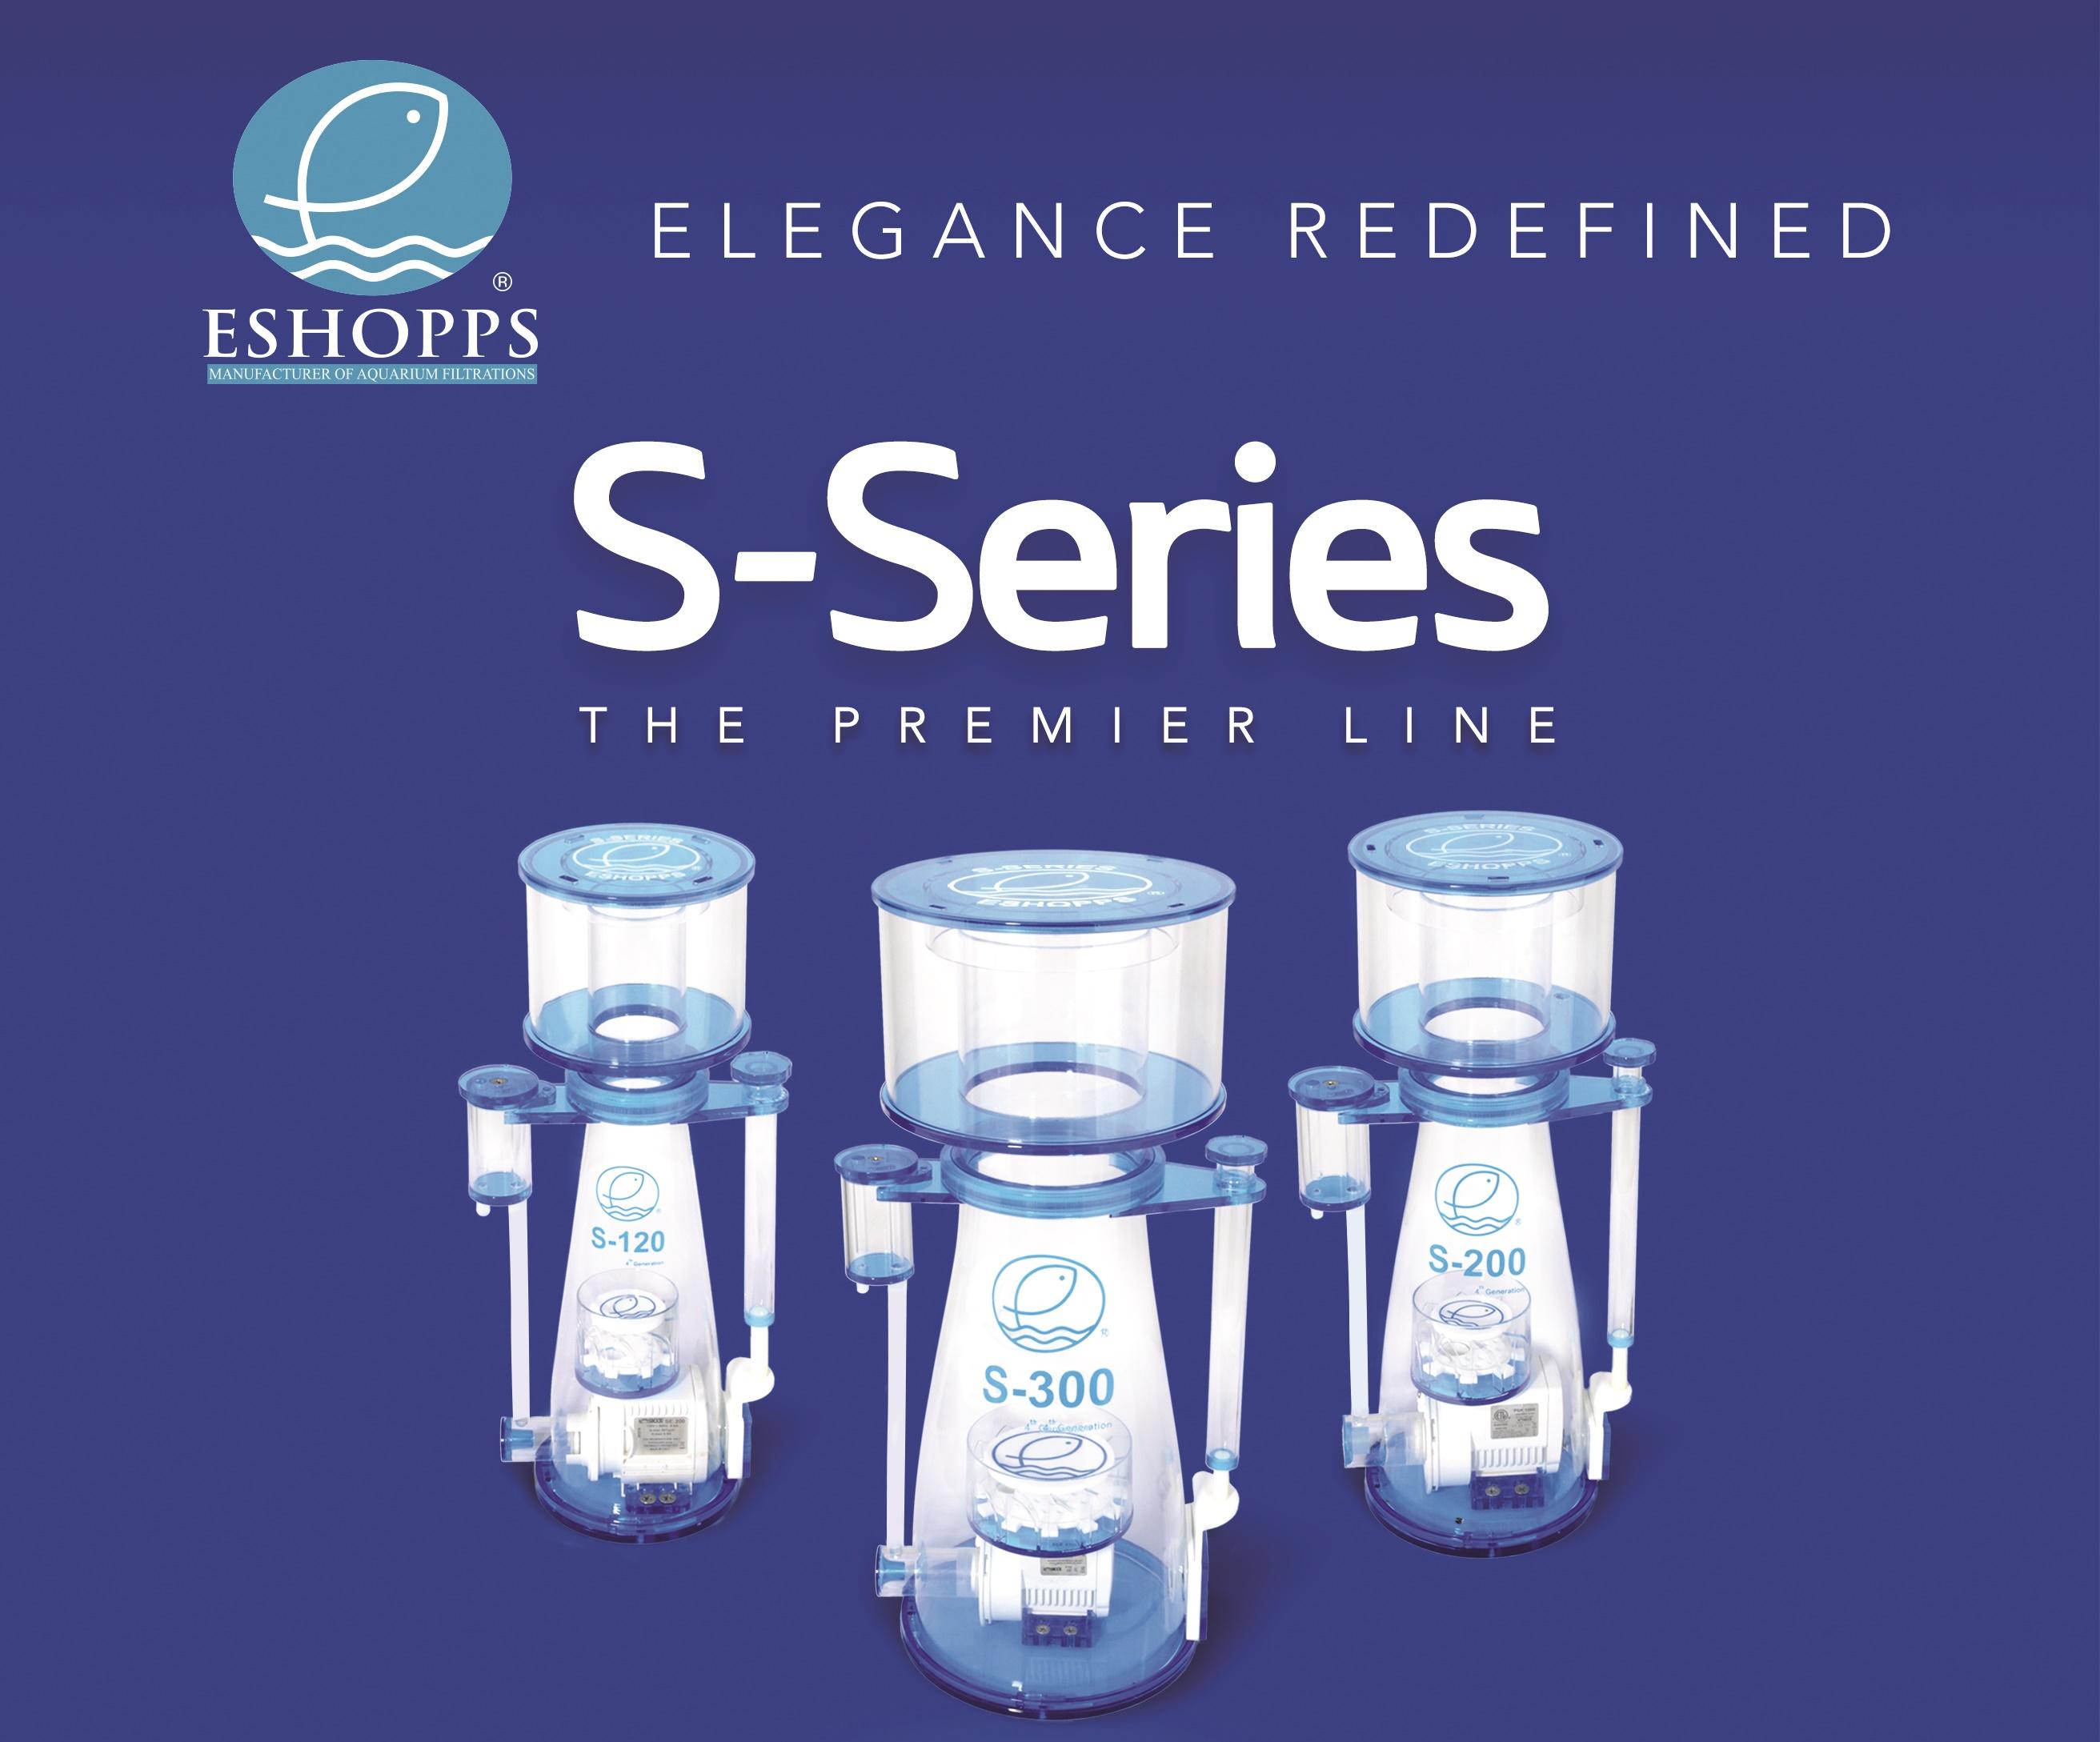 eshopps-s-series-reefs